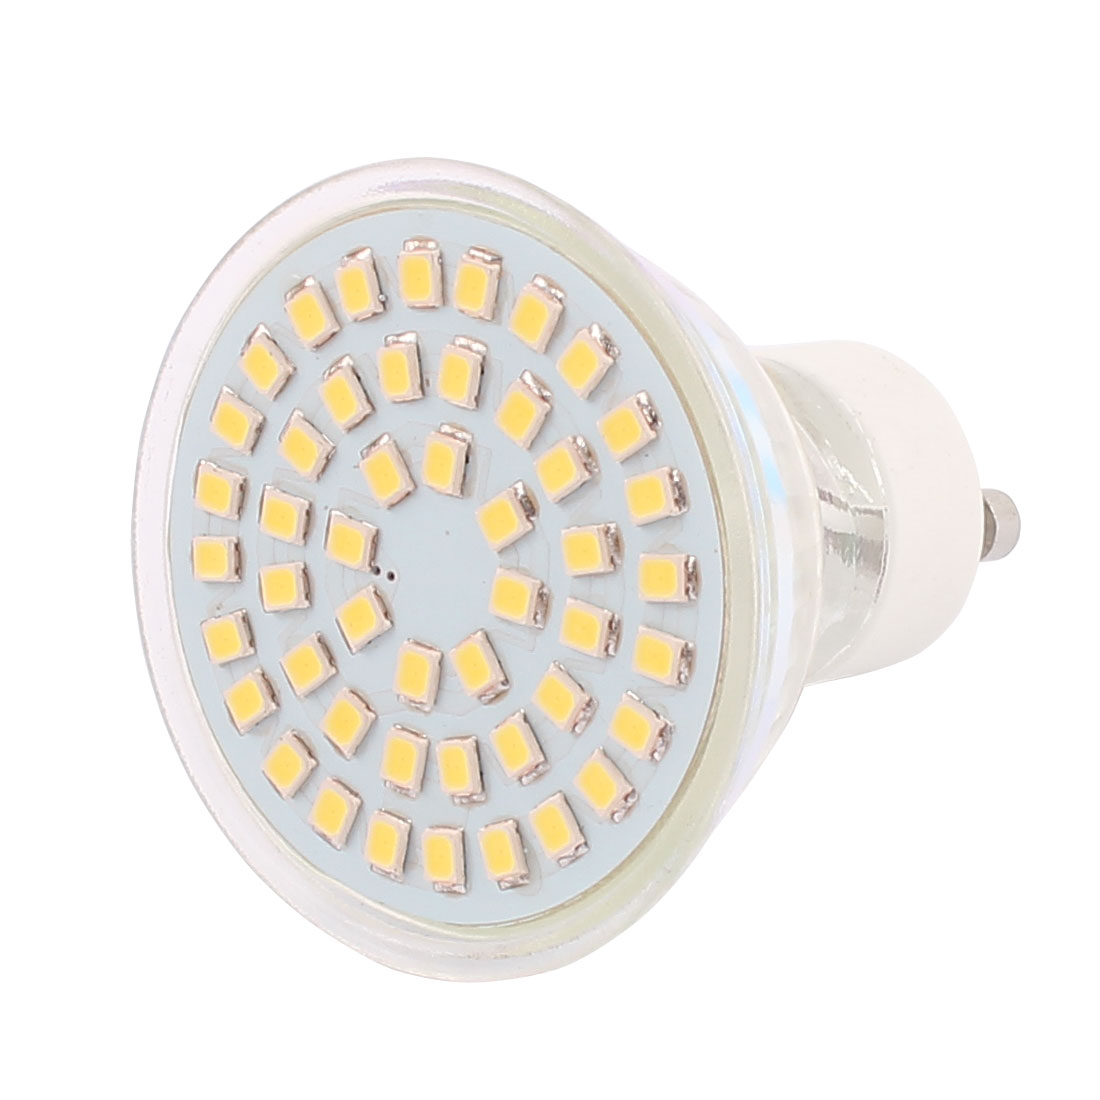 GU10 SMD 2835 48 LEDs Glass Energy-Saving LED Lamp Bulb Warm White AC 110V 4W